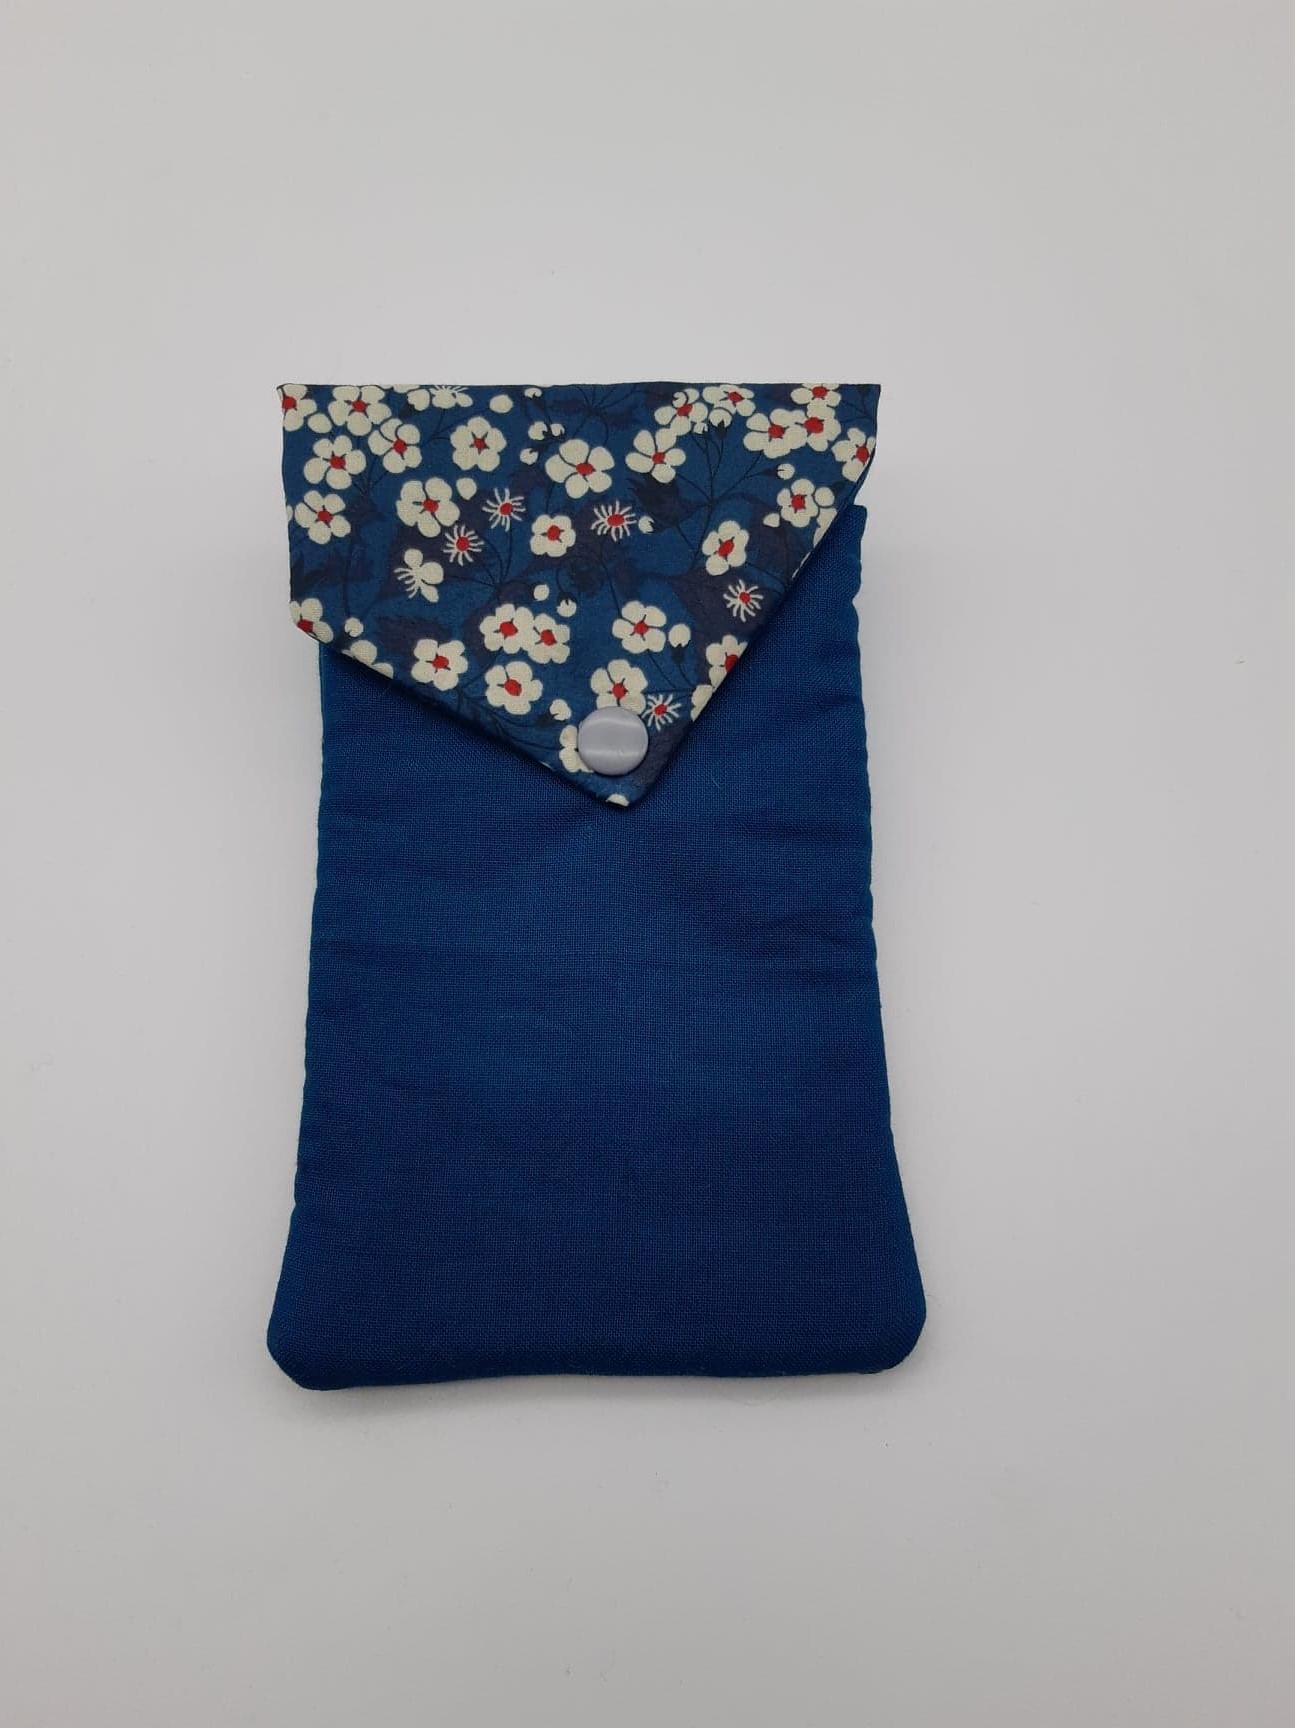 Etui portable Liberty Mitsi Blue Deep--9995753102563